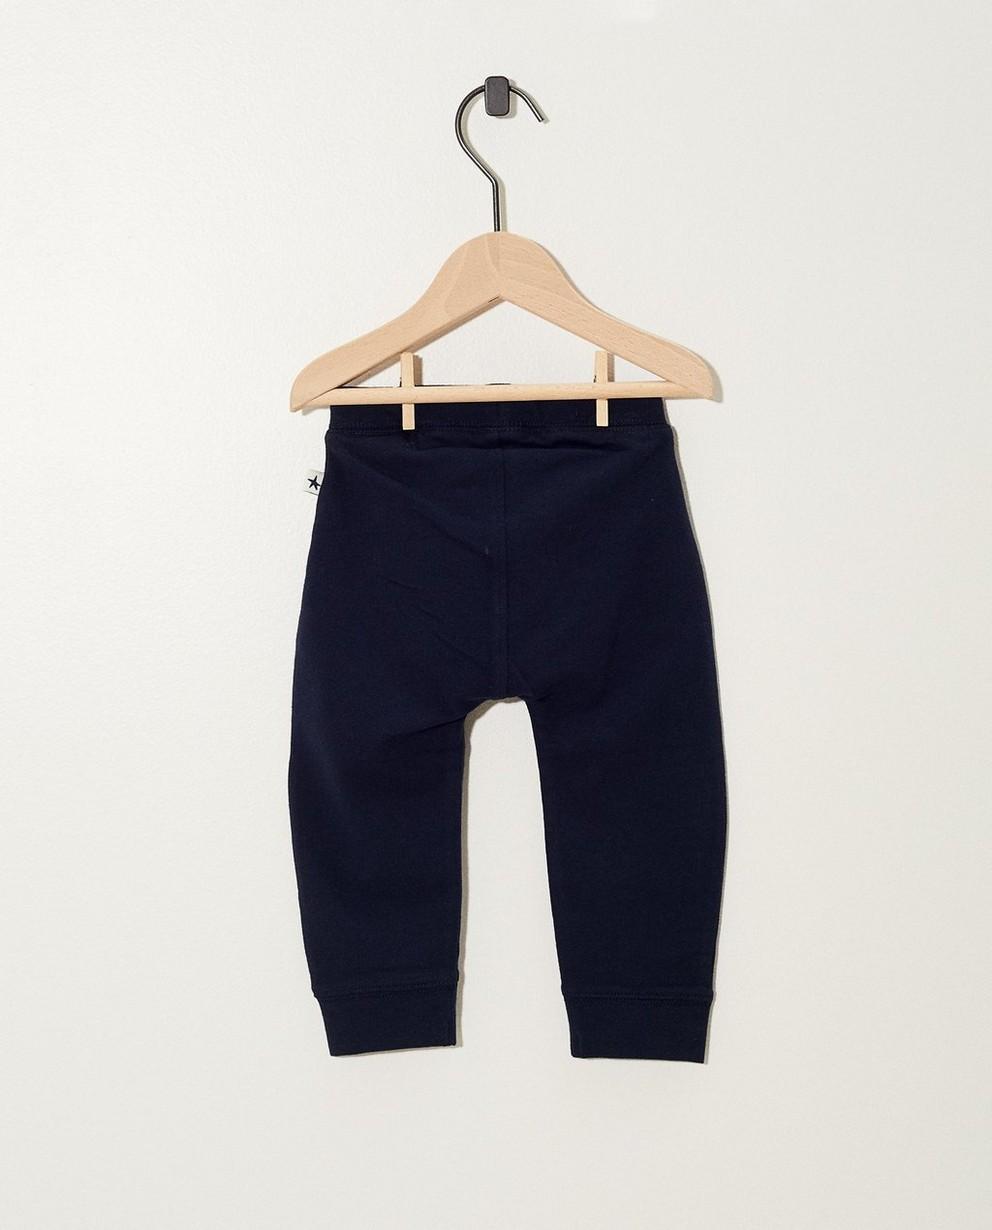 Pantalons - AO1 - Zwarte jogging van biokatoen